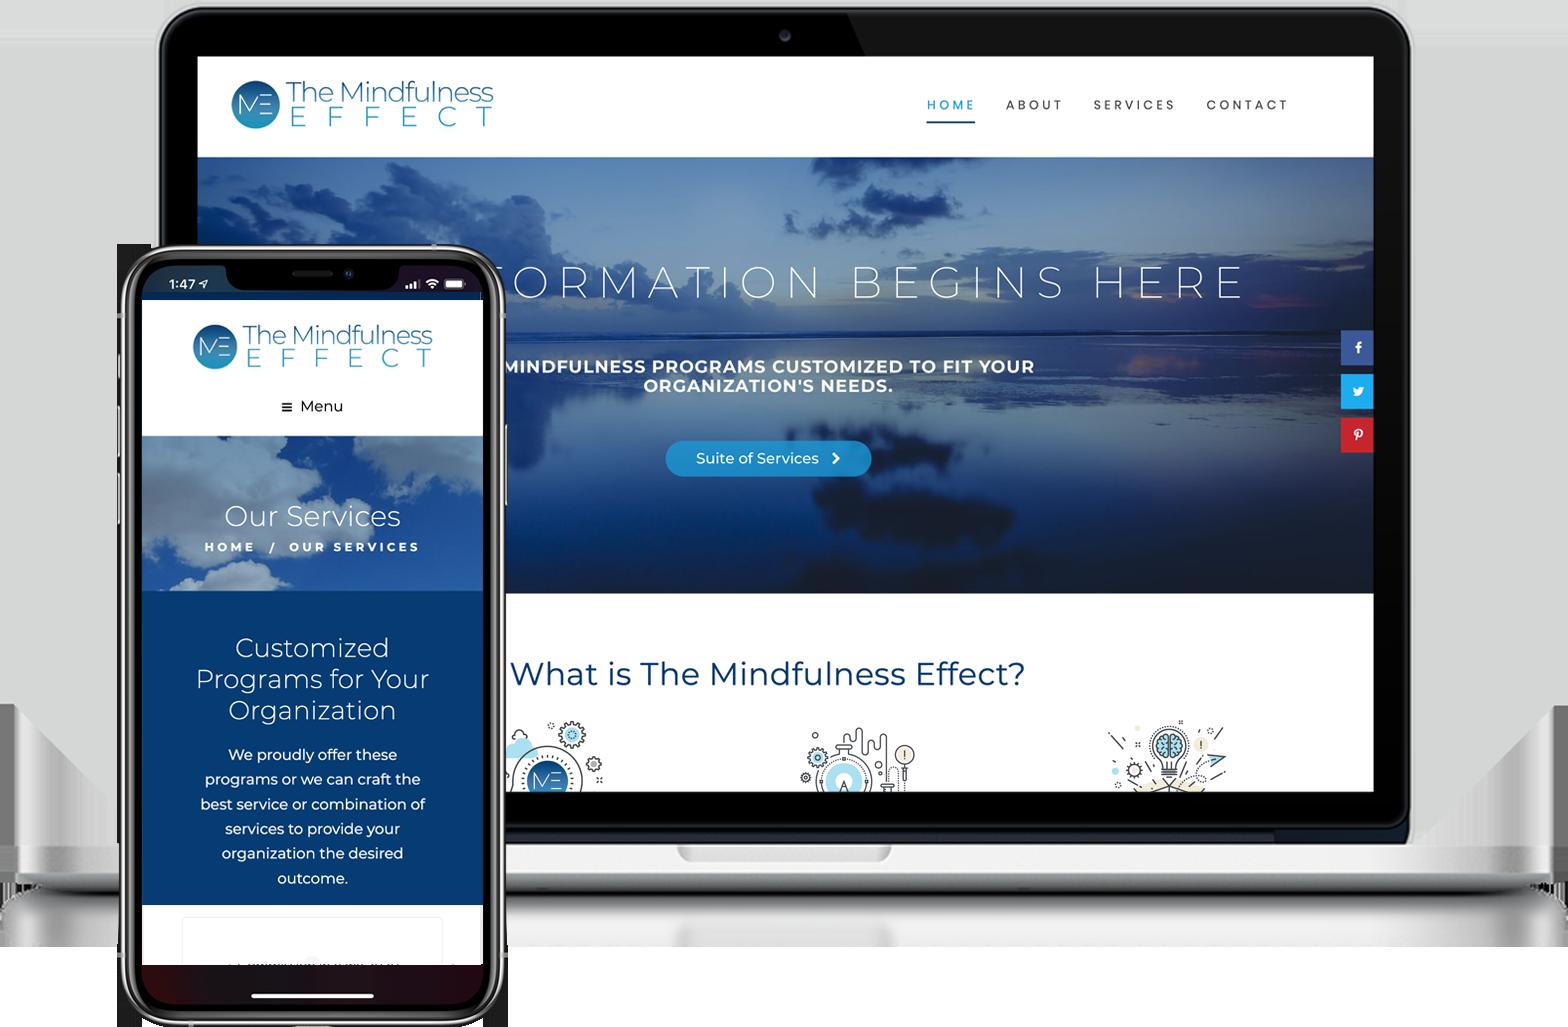 Mindfulness Effect